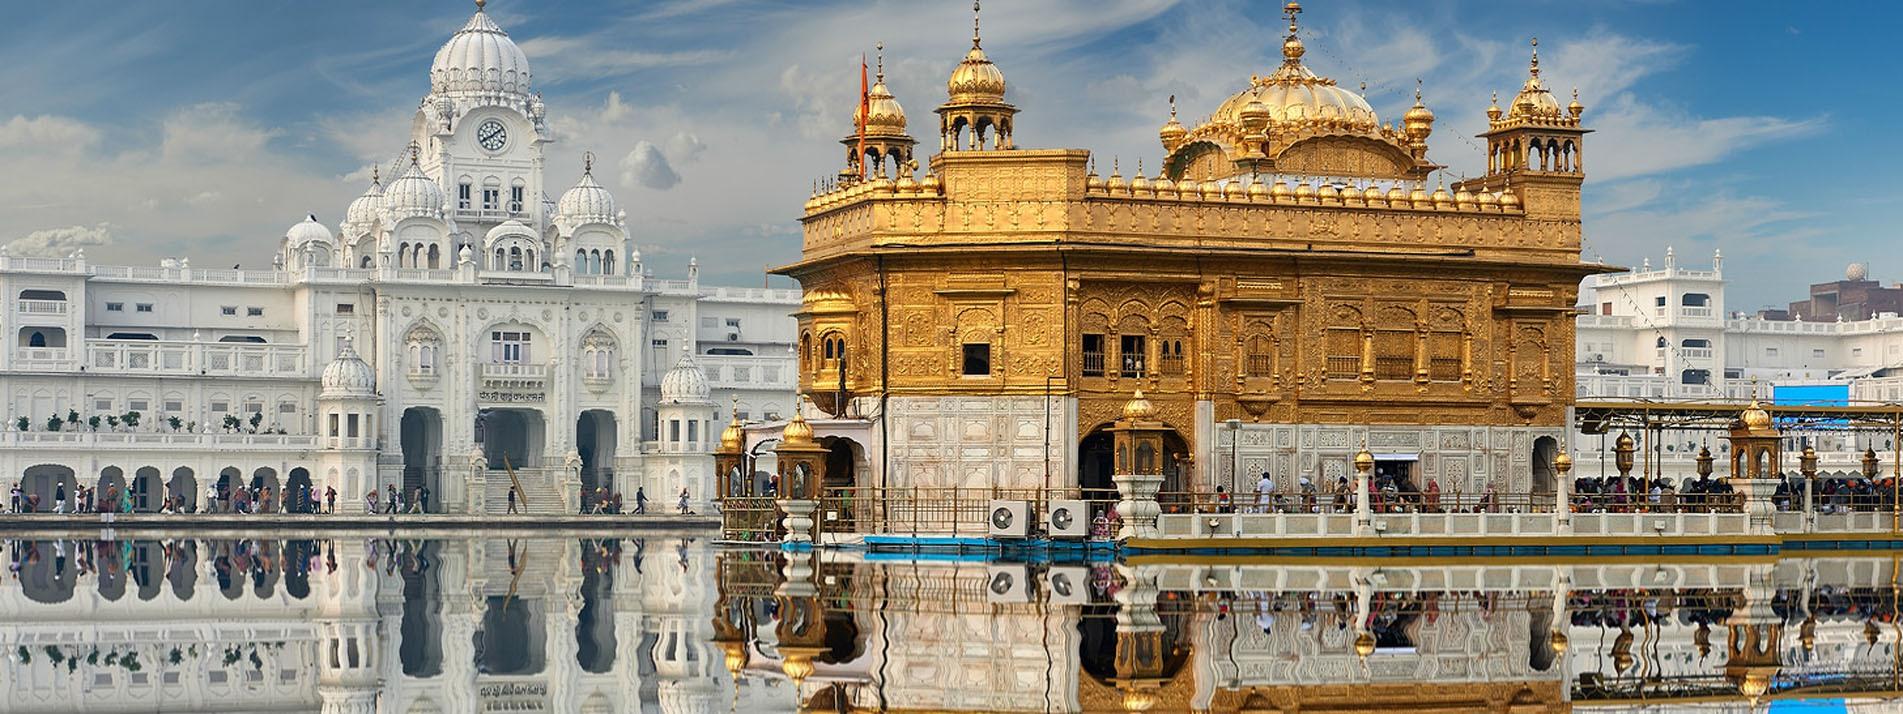 10-Day North India Tour (Delhi to Shimla)